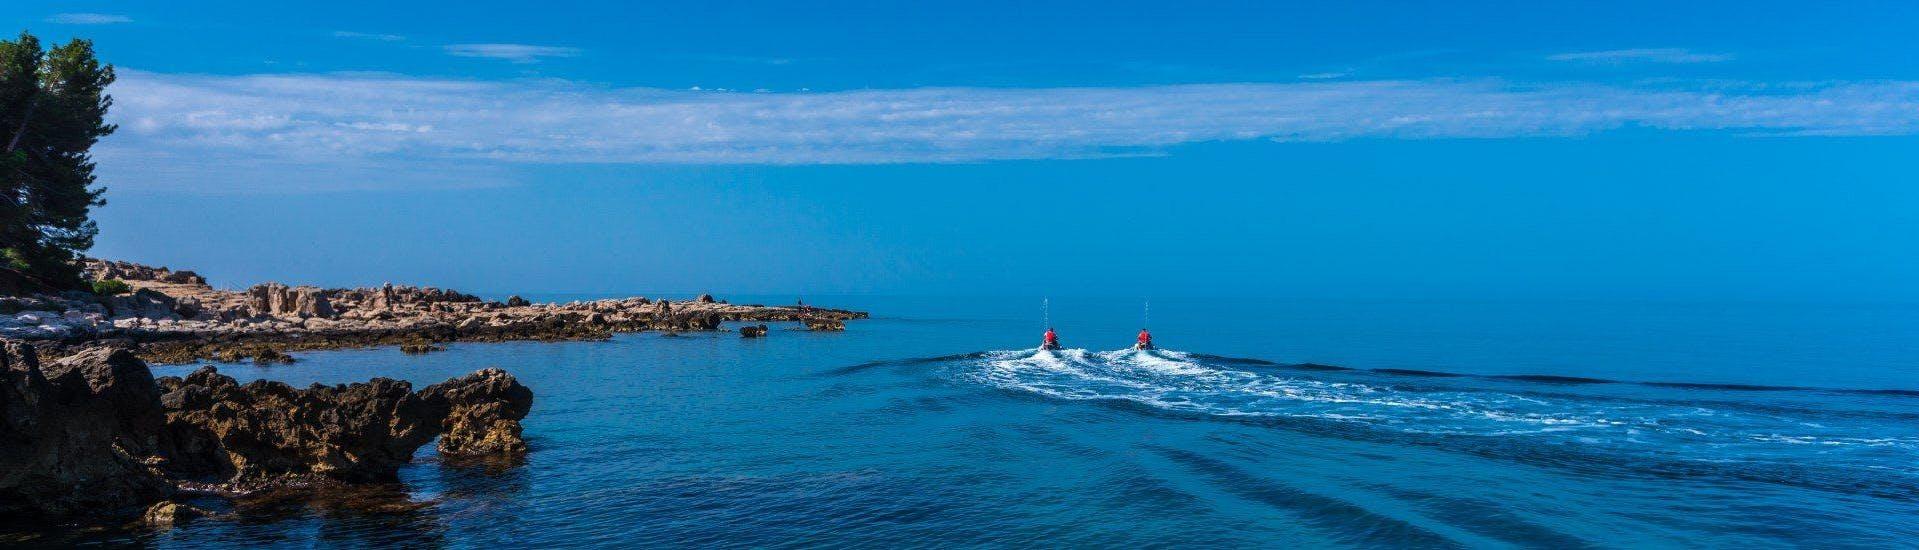 Jet Ski Safari from Lapad to Elaphite Islands